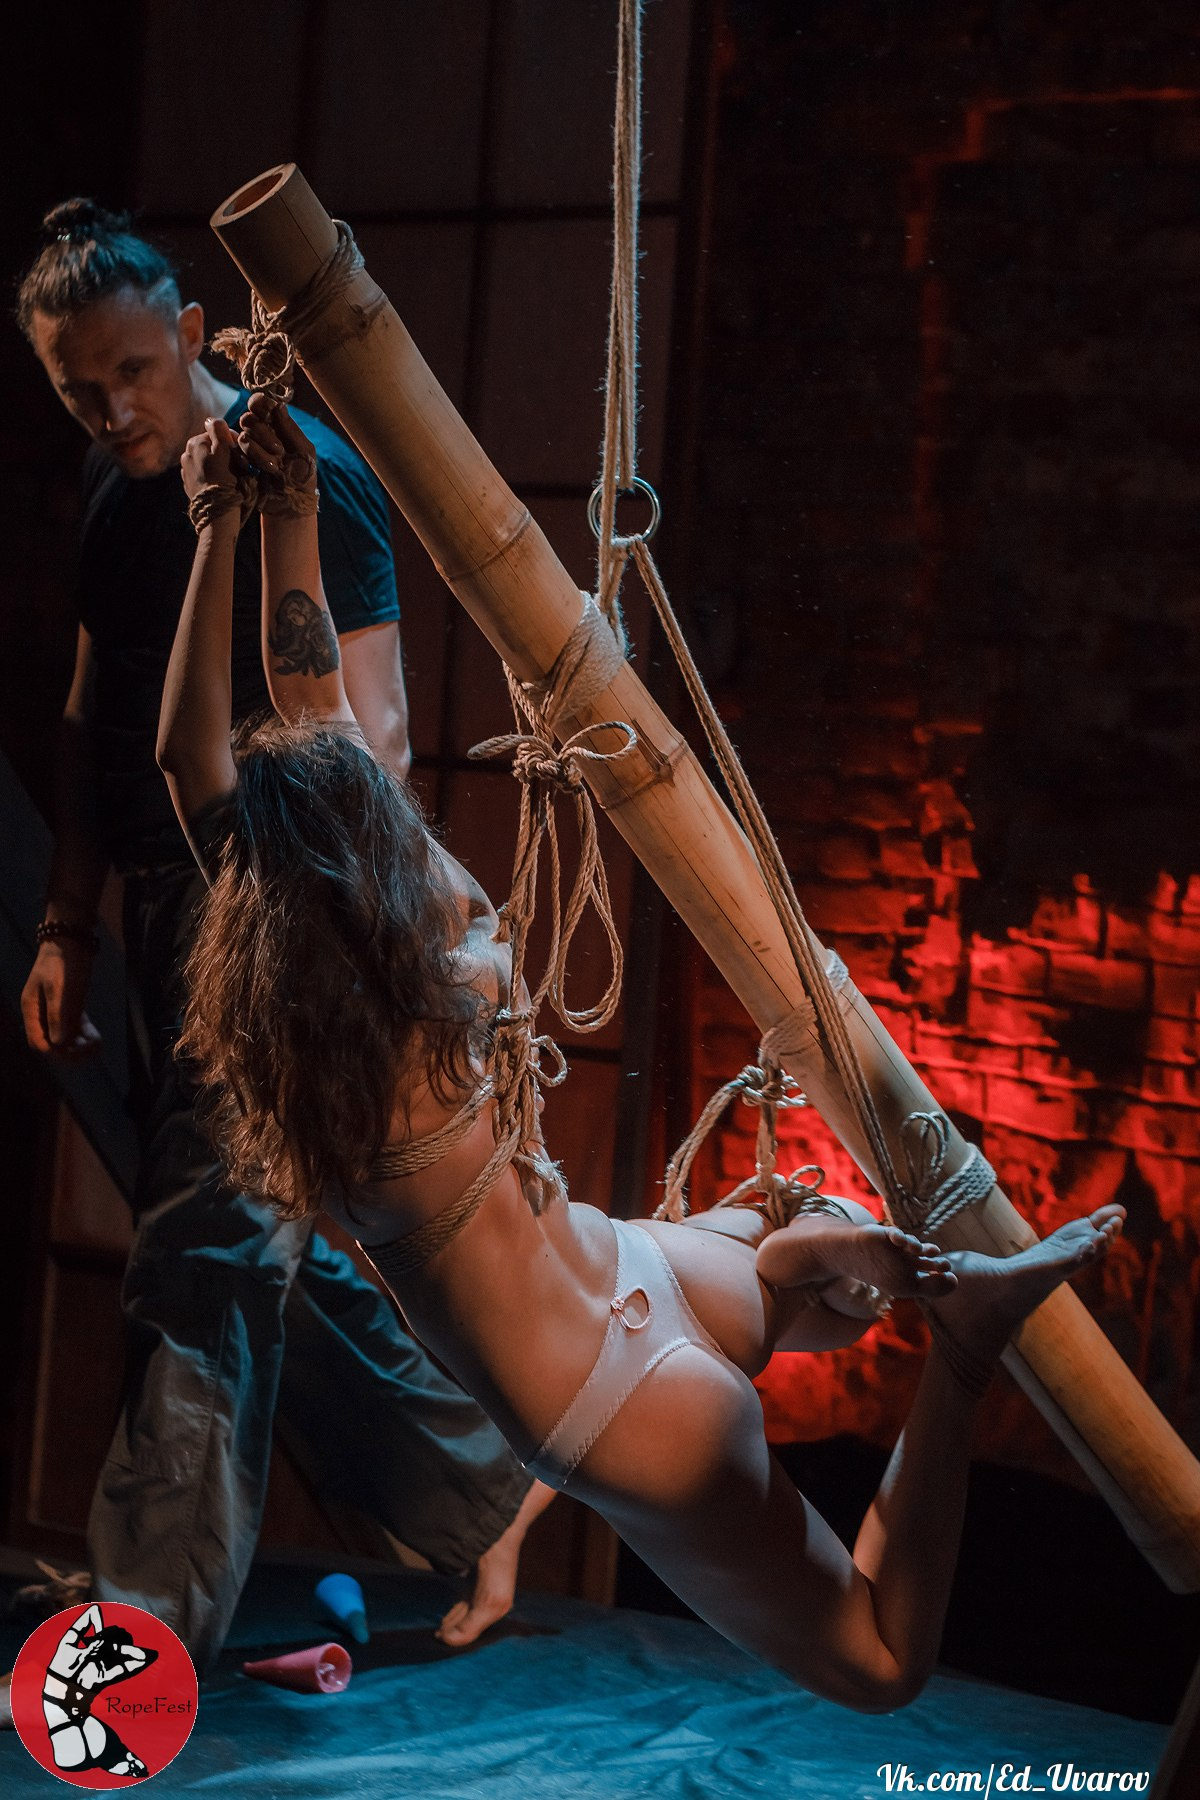 Rope Fest Peterburg 2018. Bondage: Mosafir. Photo by Ed Uvarov